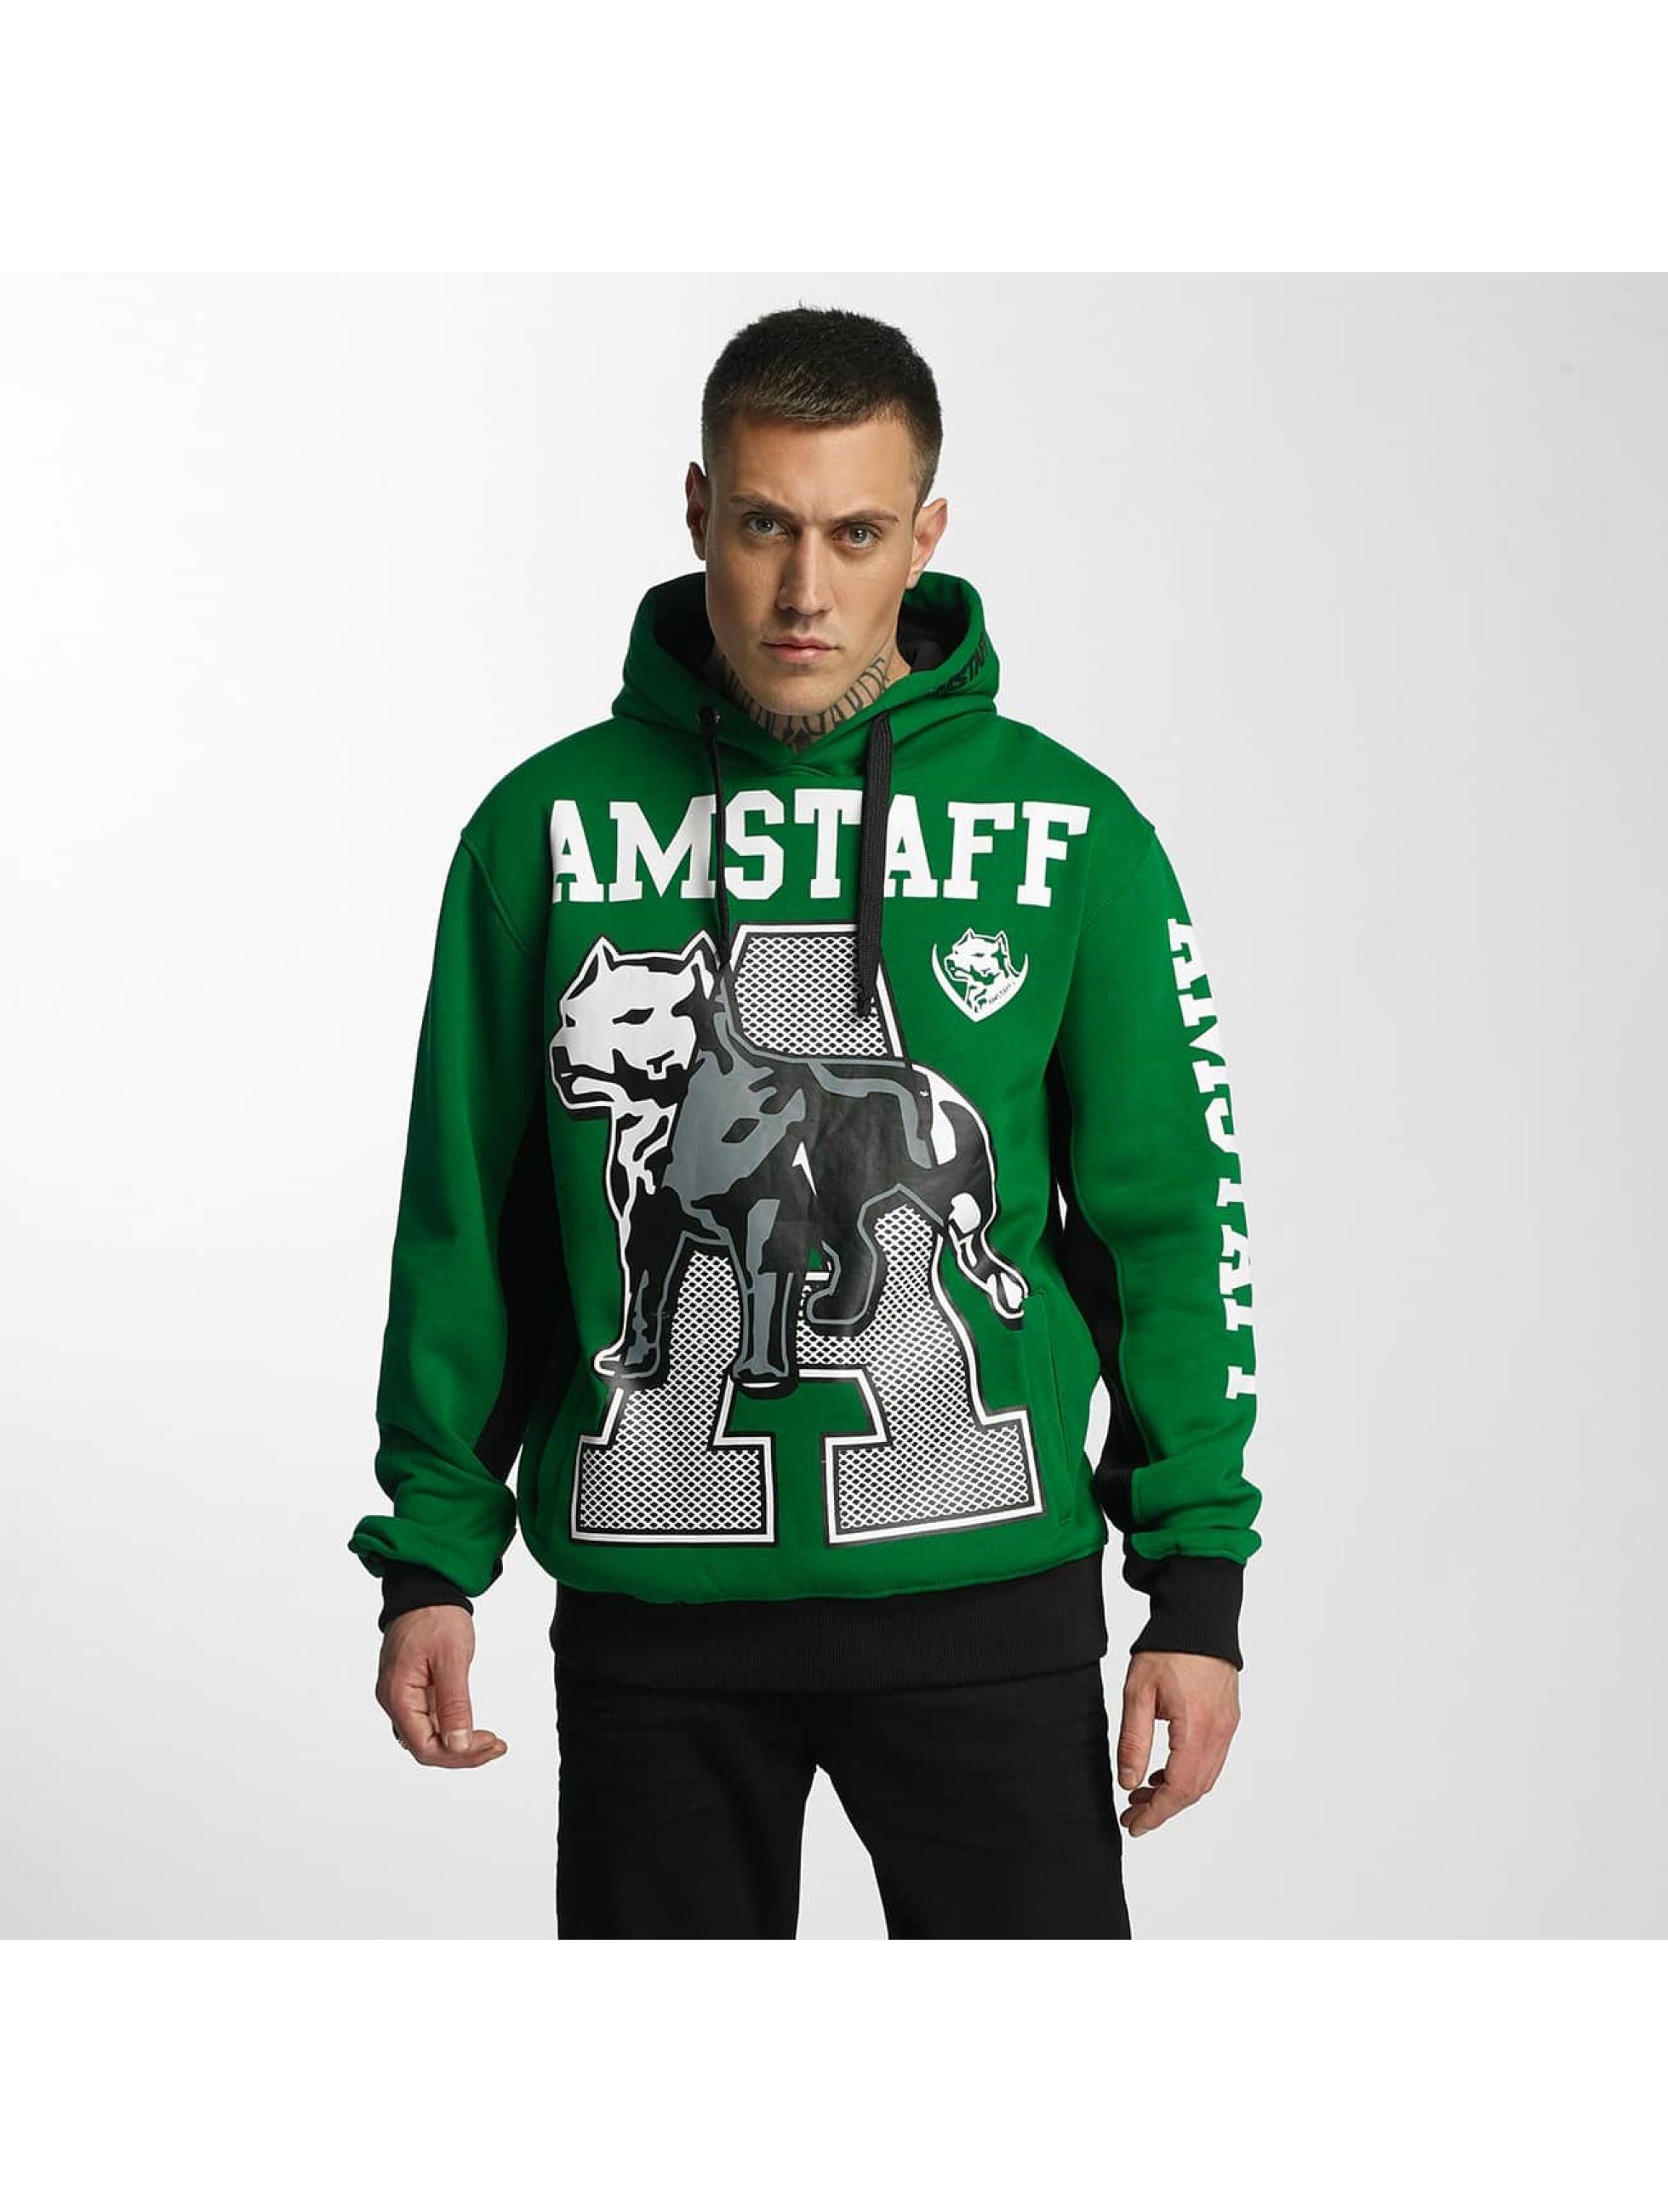 Amstaff Mikiny Aldor zelená